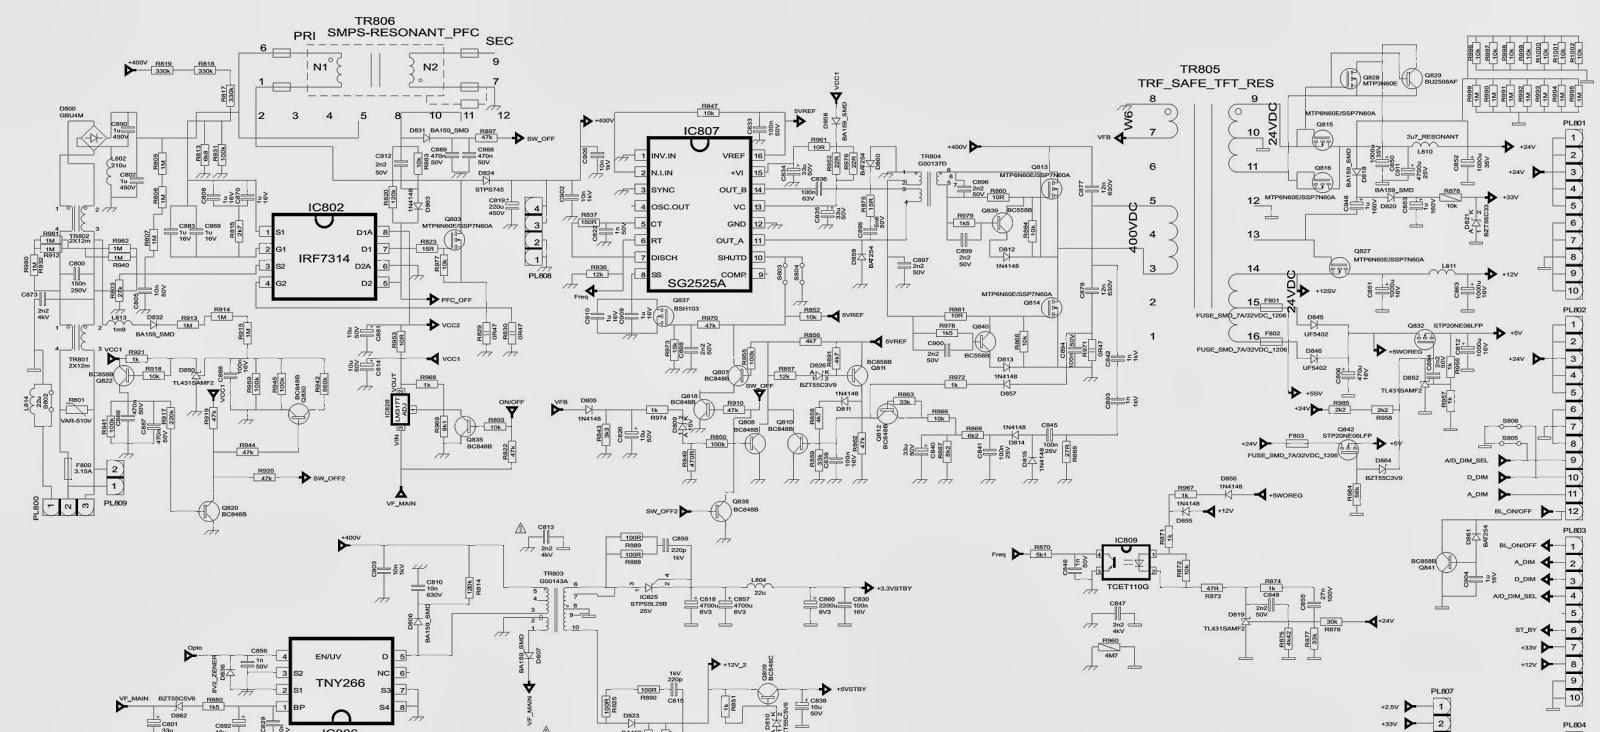 Pleasant Hitachi 37Ld6600 Lcd Tv Resonant Mode Tft Power Supply Wiring Digital Resources Cettecompassionincorg